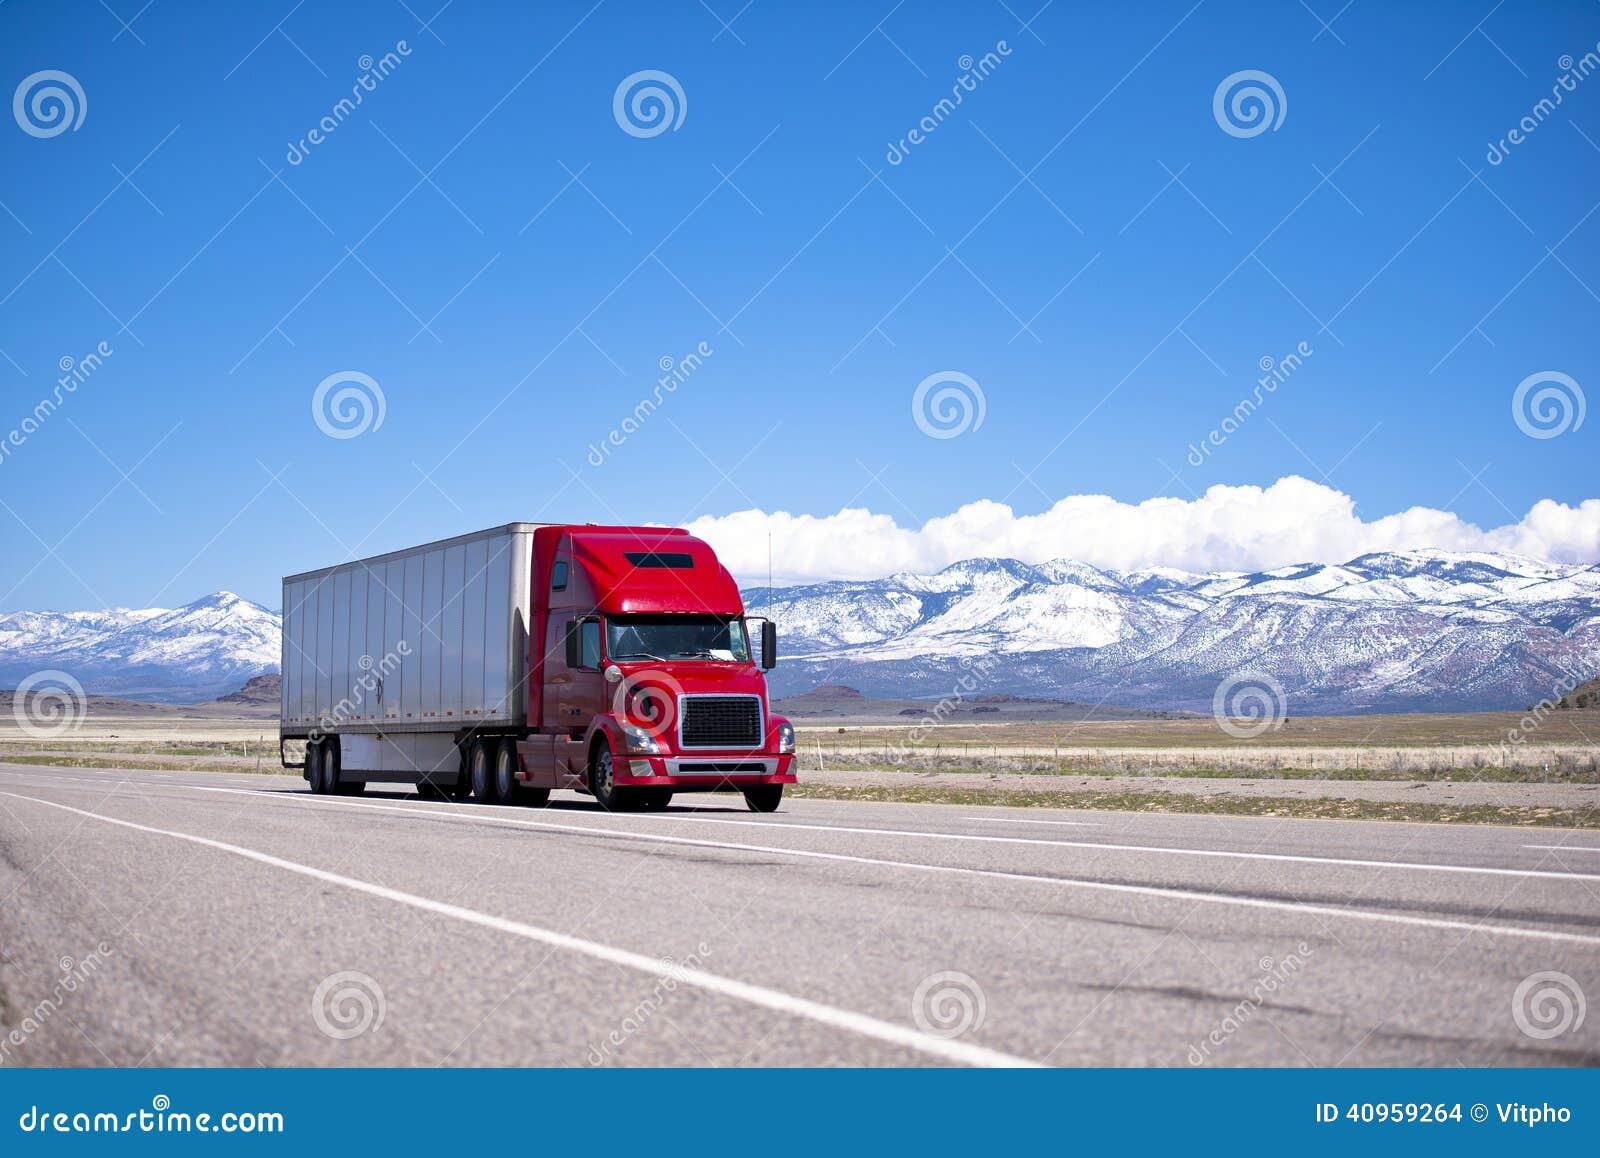 Bright Red Semi Truck Modern Transportation On Spectacular Highw ...